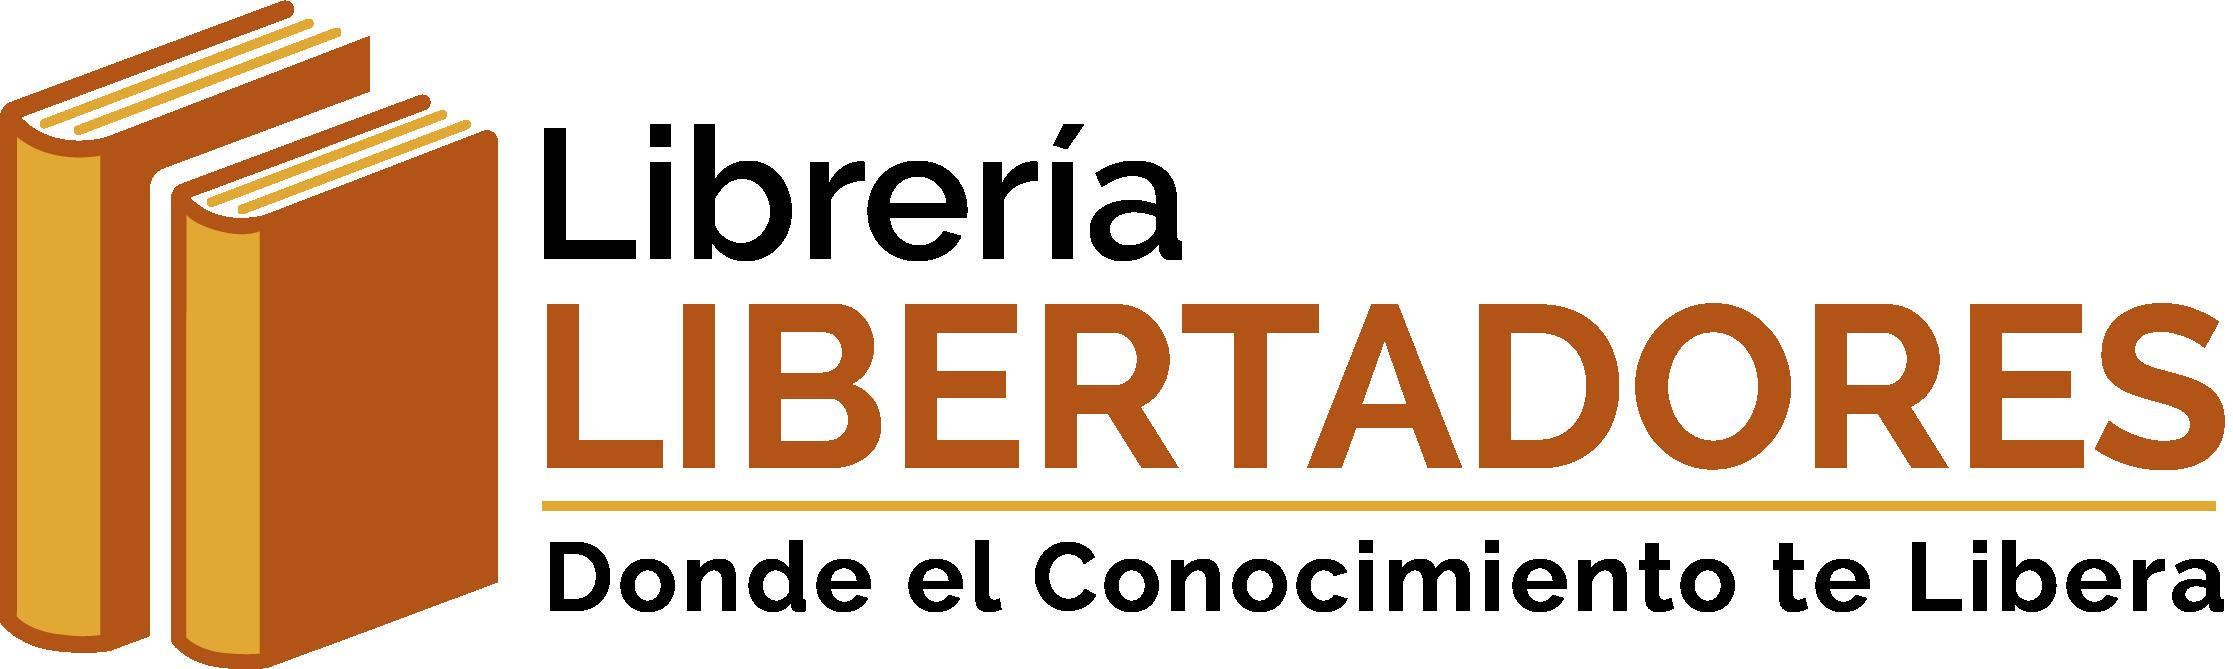 Design a smart and modern logo for bookstore Libreria Libertadores